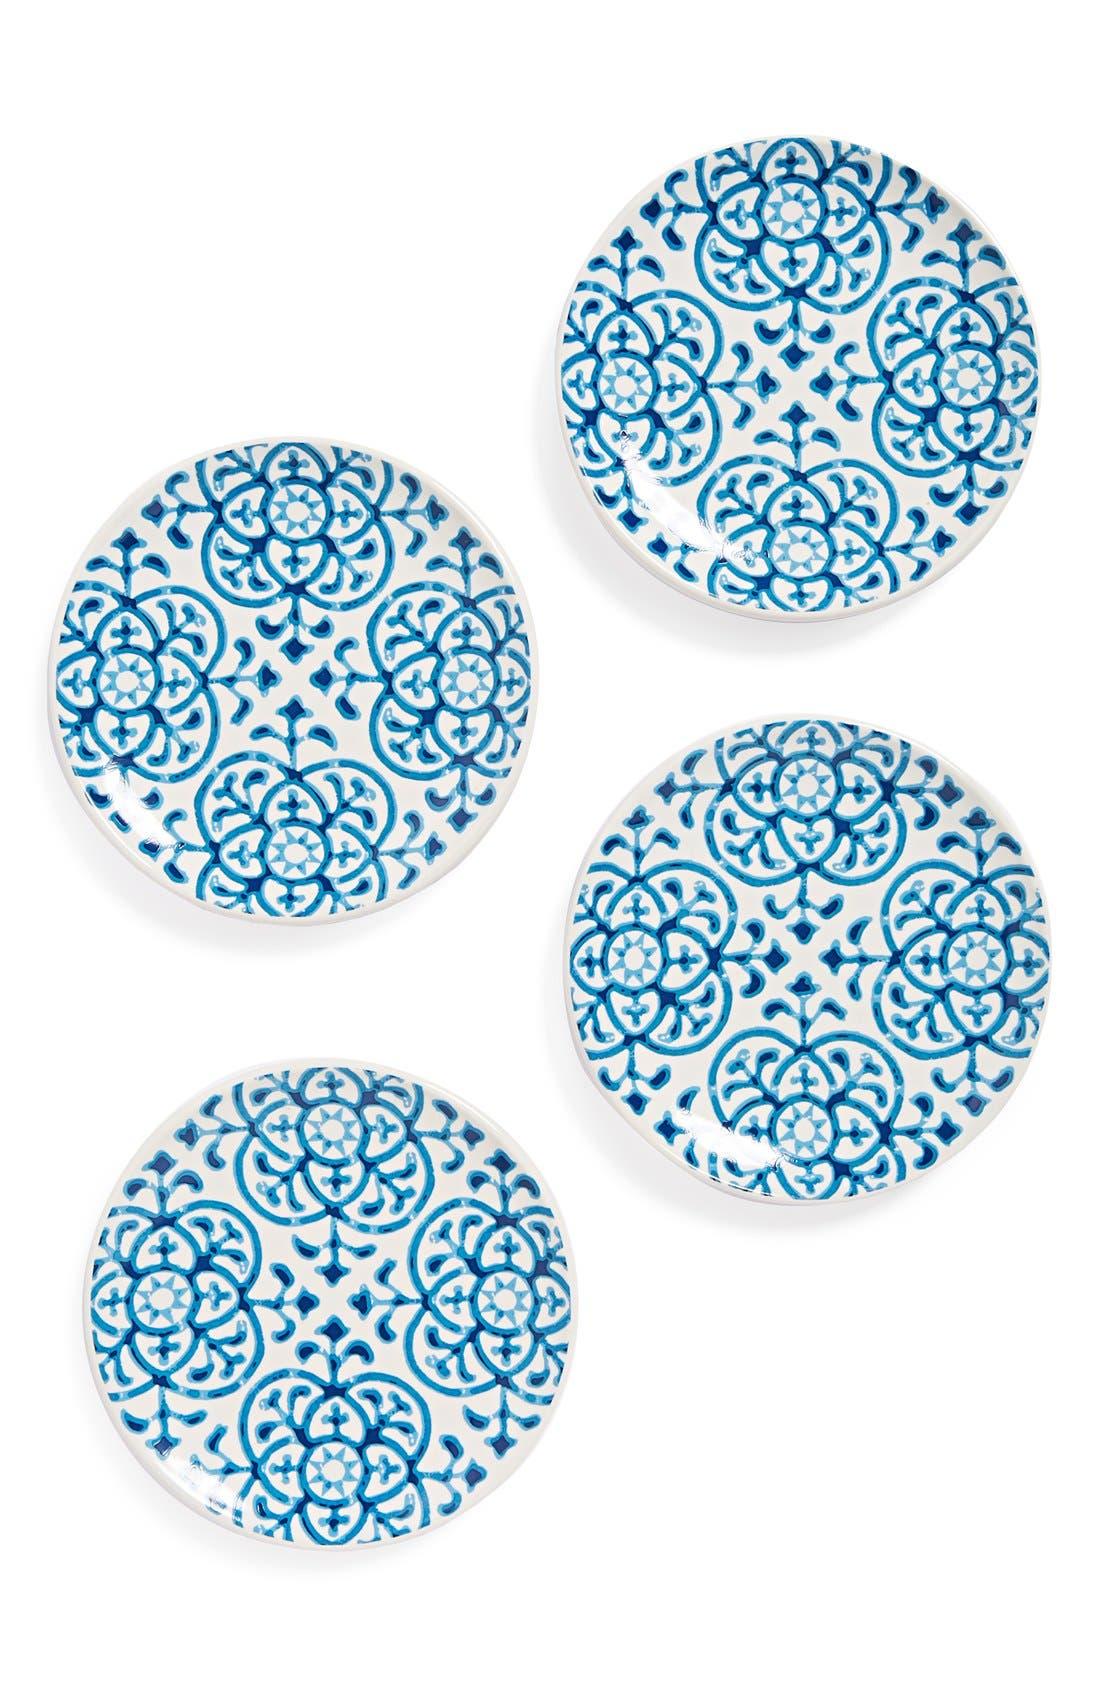 Alternate Image 1 Selected - Signature Housewares Indigo Tile Plates (Set of 4)